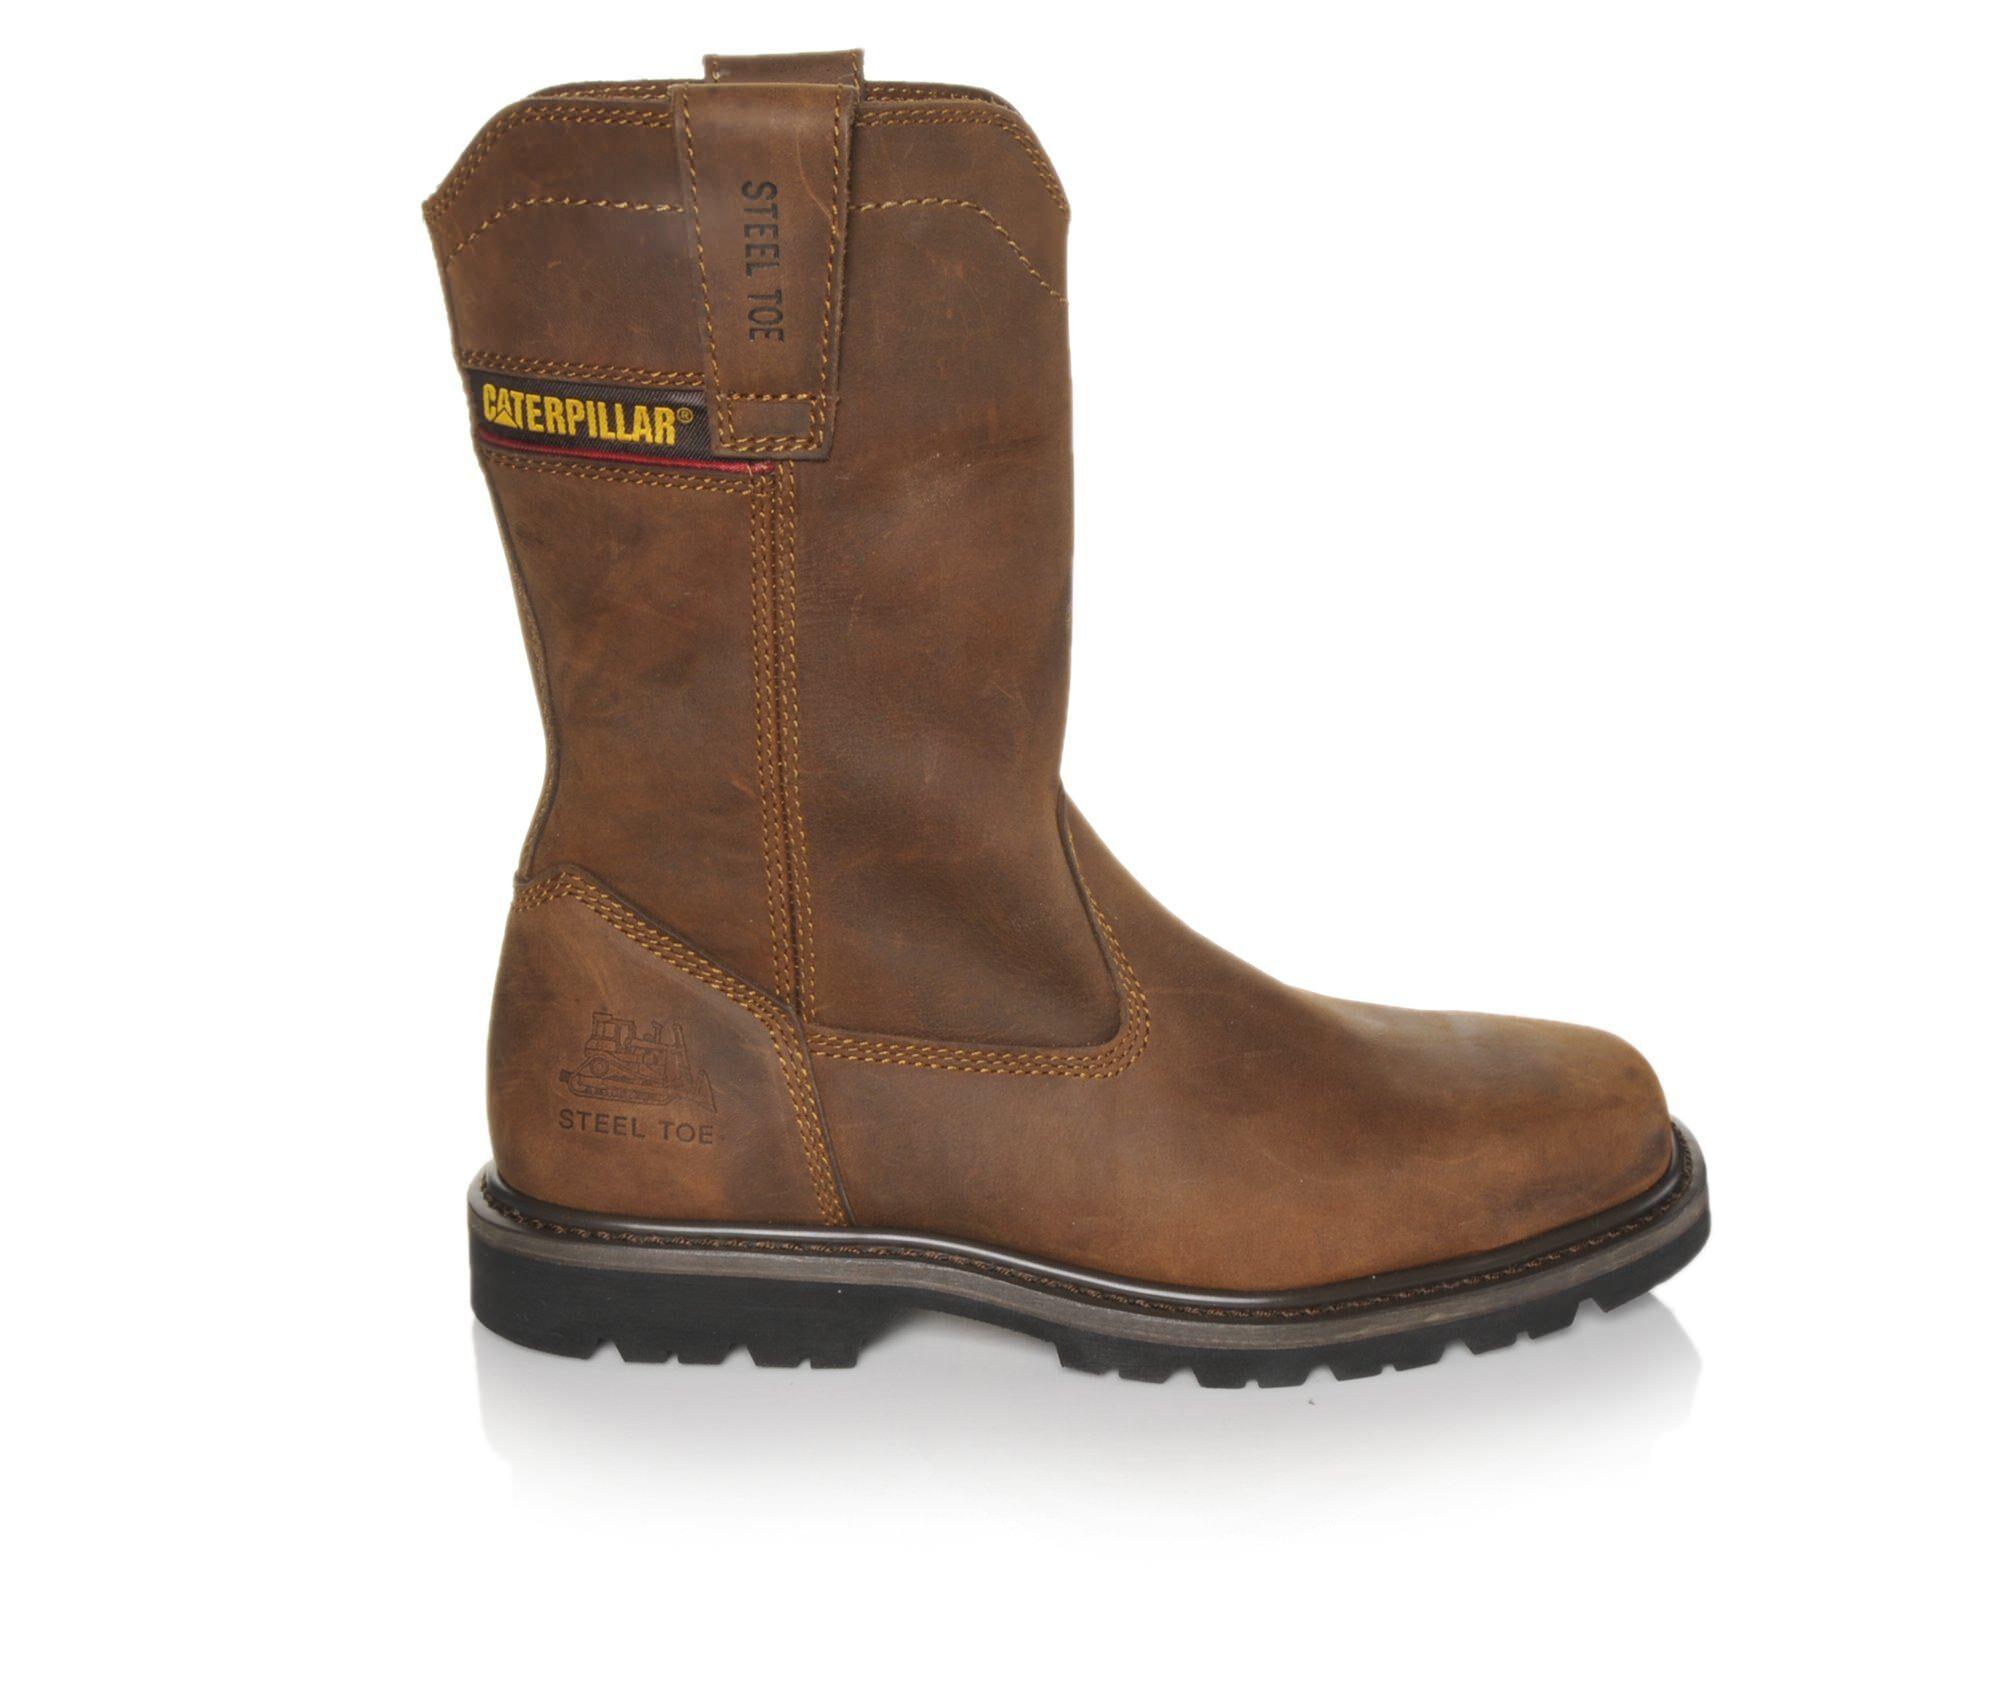 Images Mens Caterpillar Wellston Steel Toe Work Boots